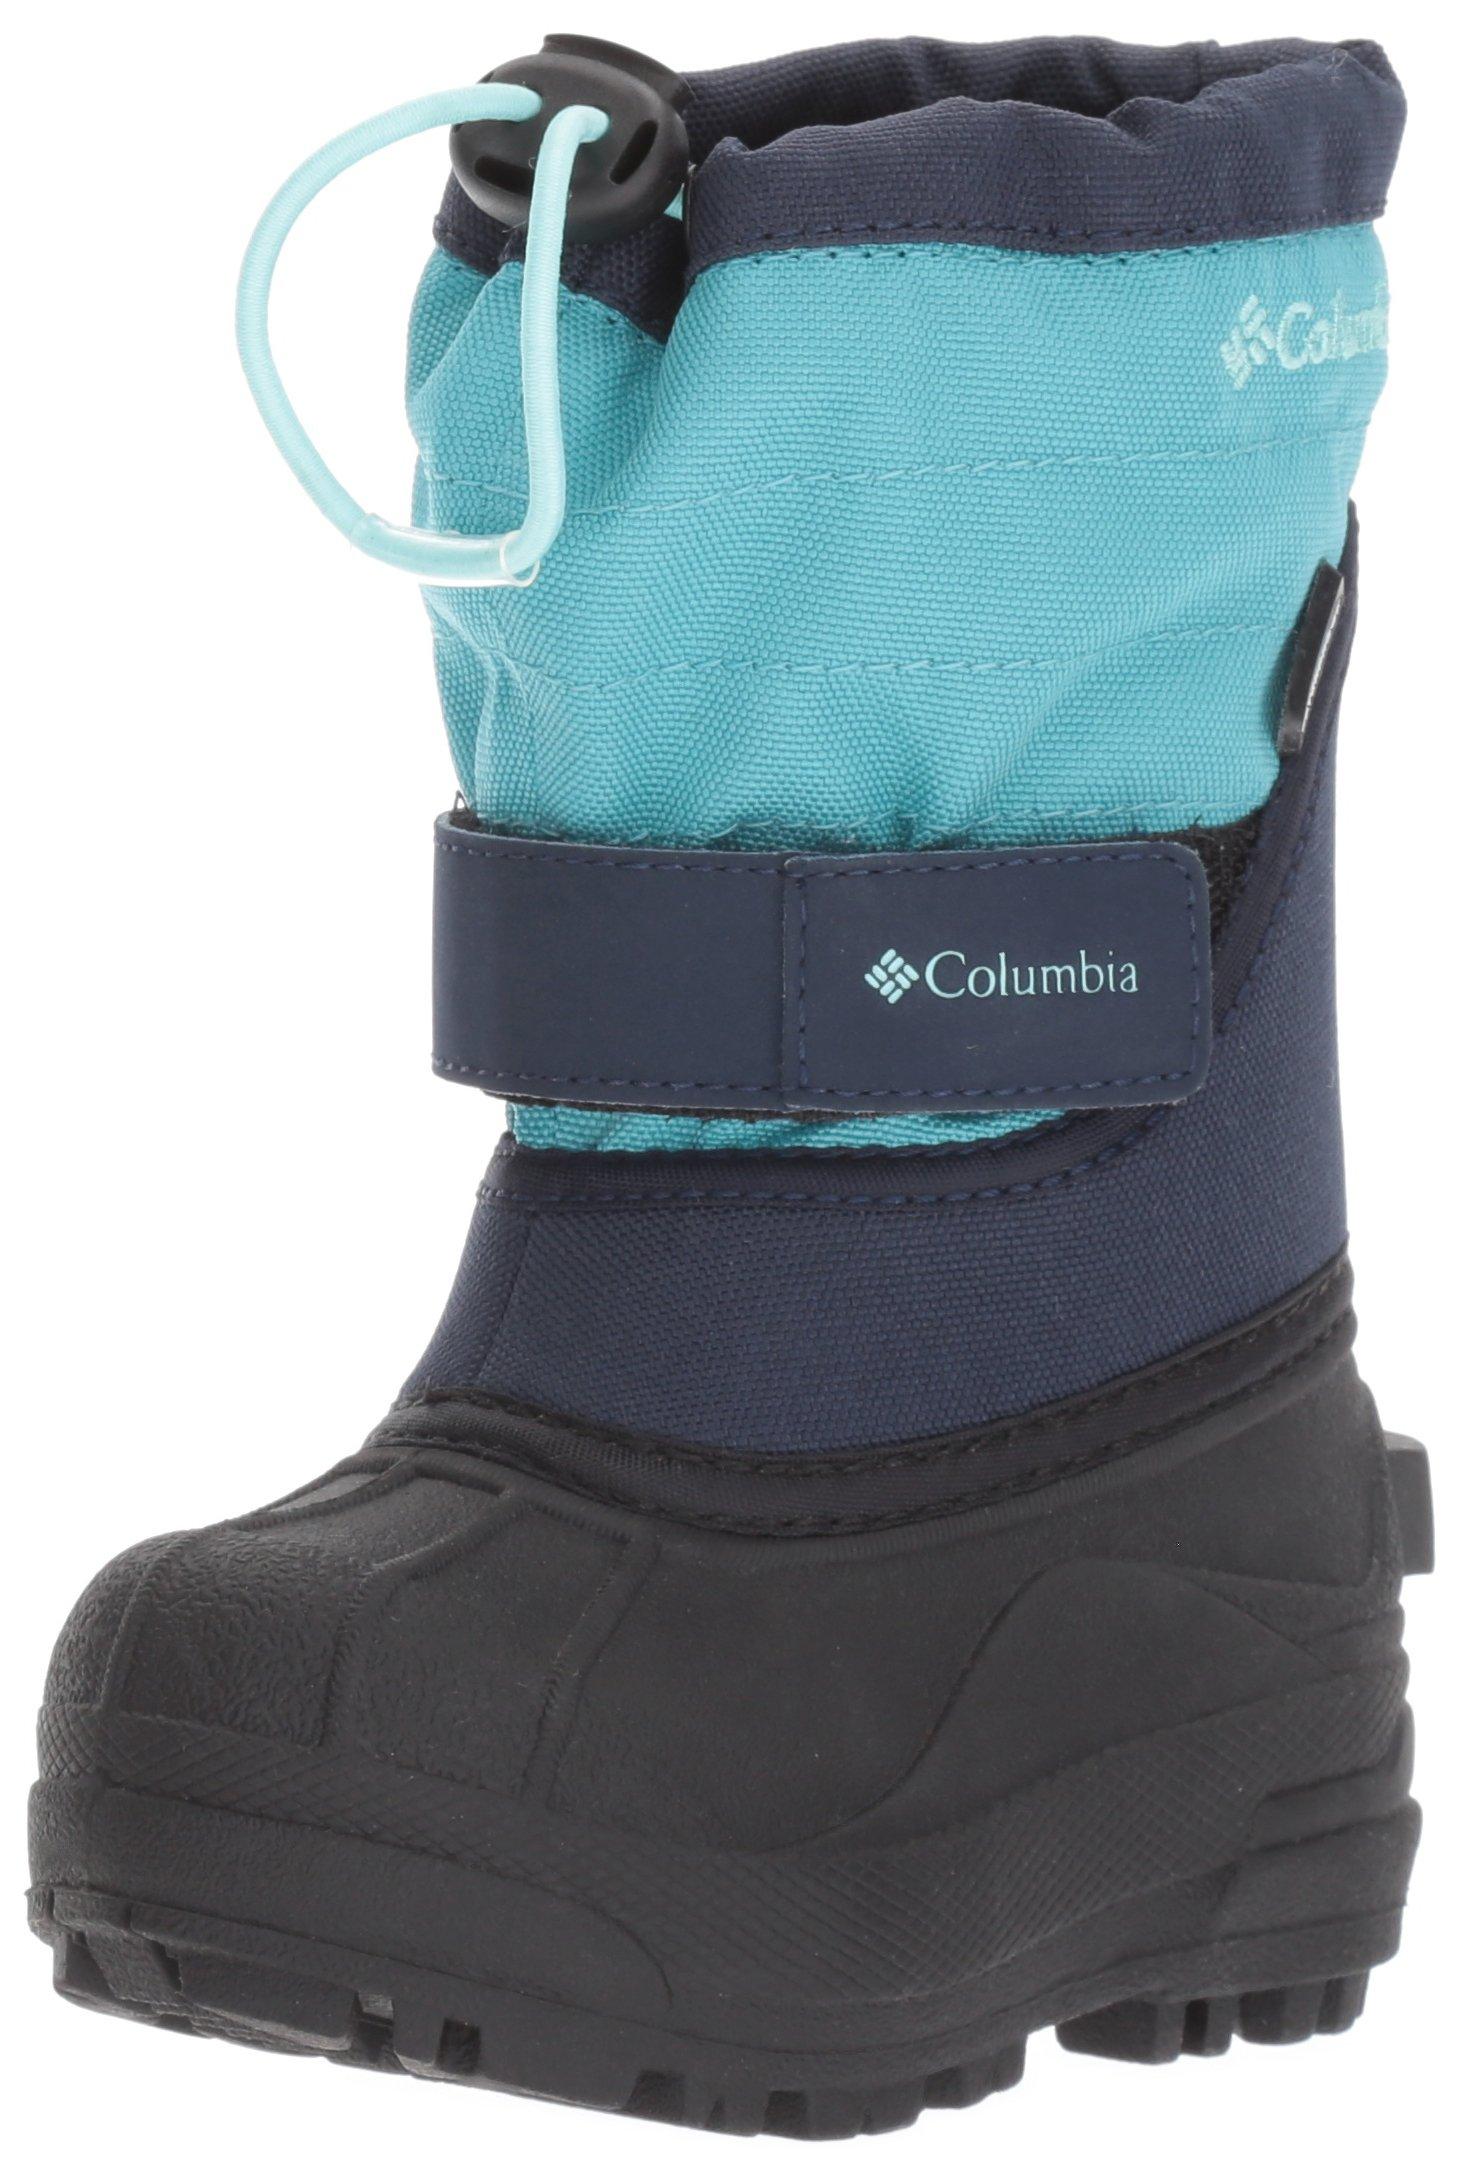 Columbia Girls' Powderbug Plus II Snow Boot, Pacific Rim, Spray, 7 M US Toddler